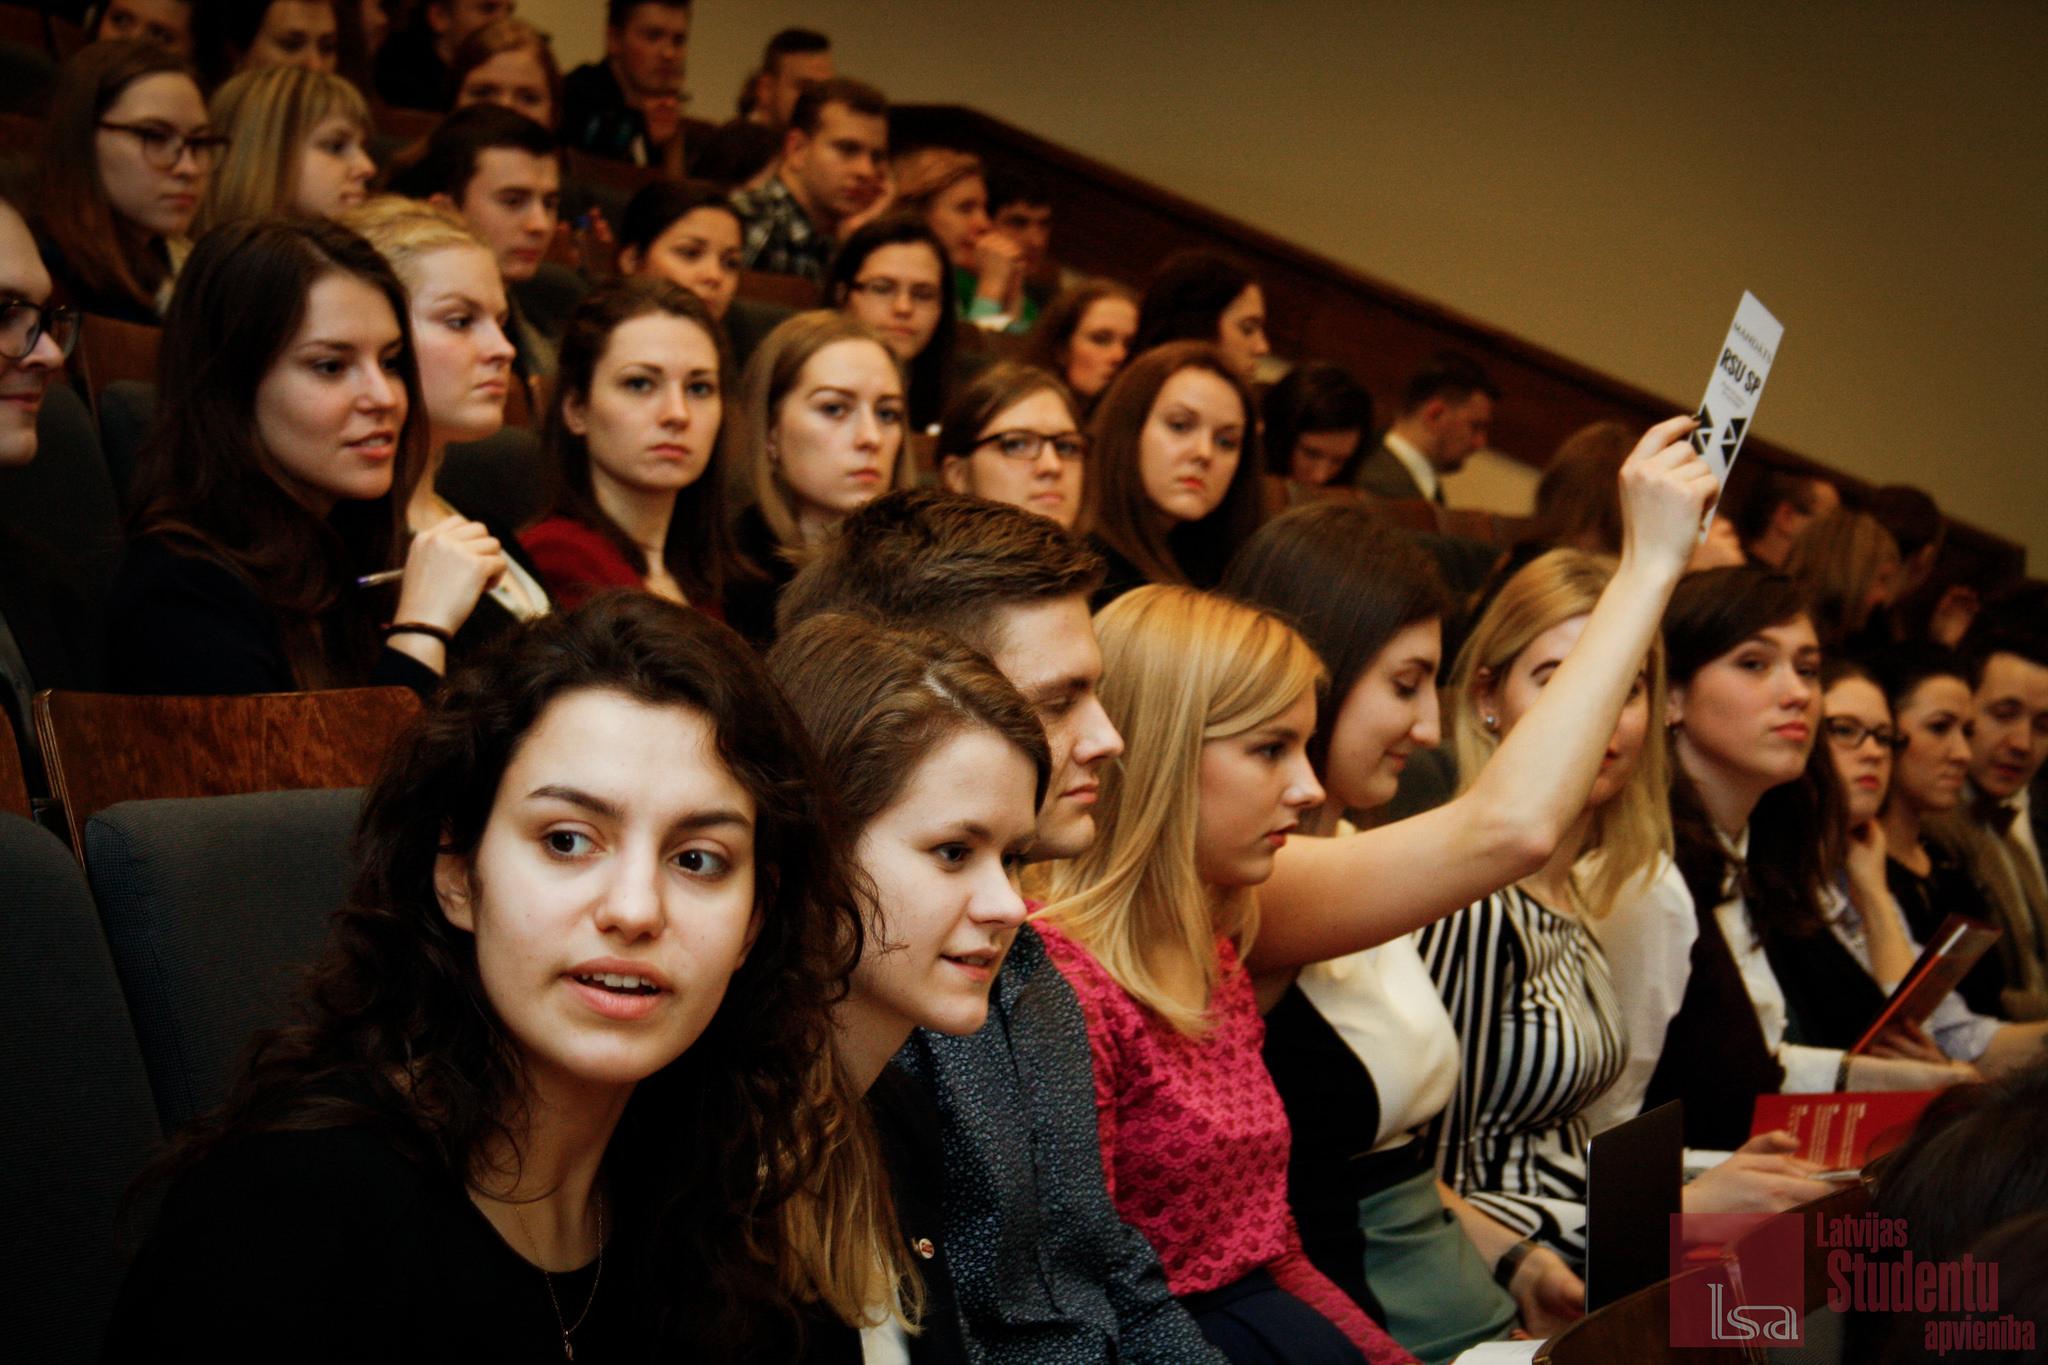 Latvijas Studentu apvienība - studentu pašpārvalde